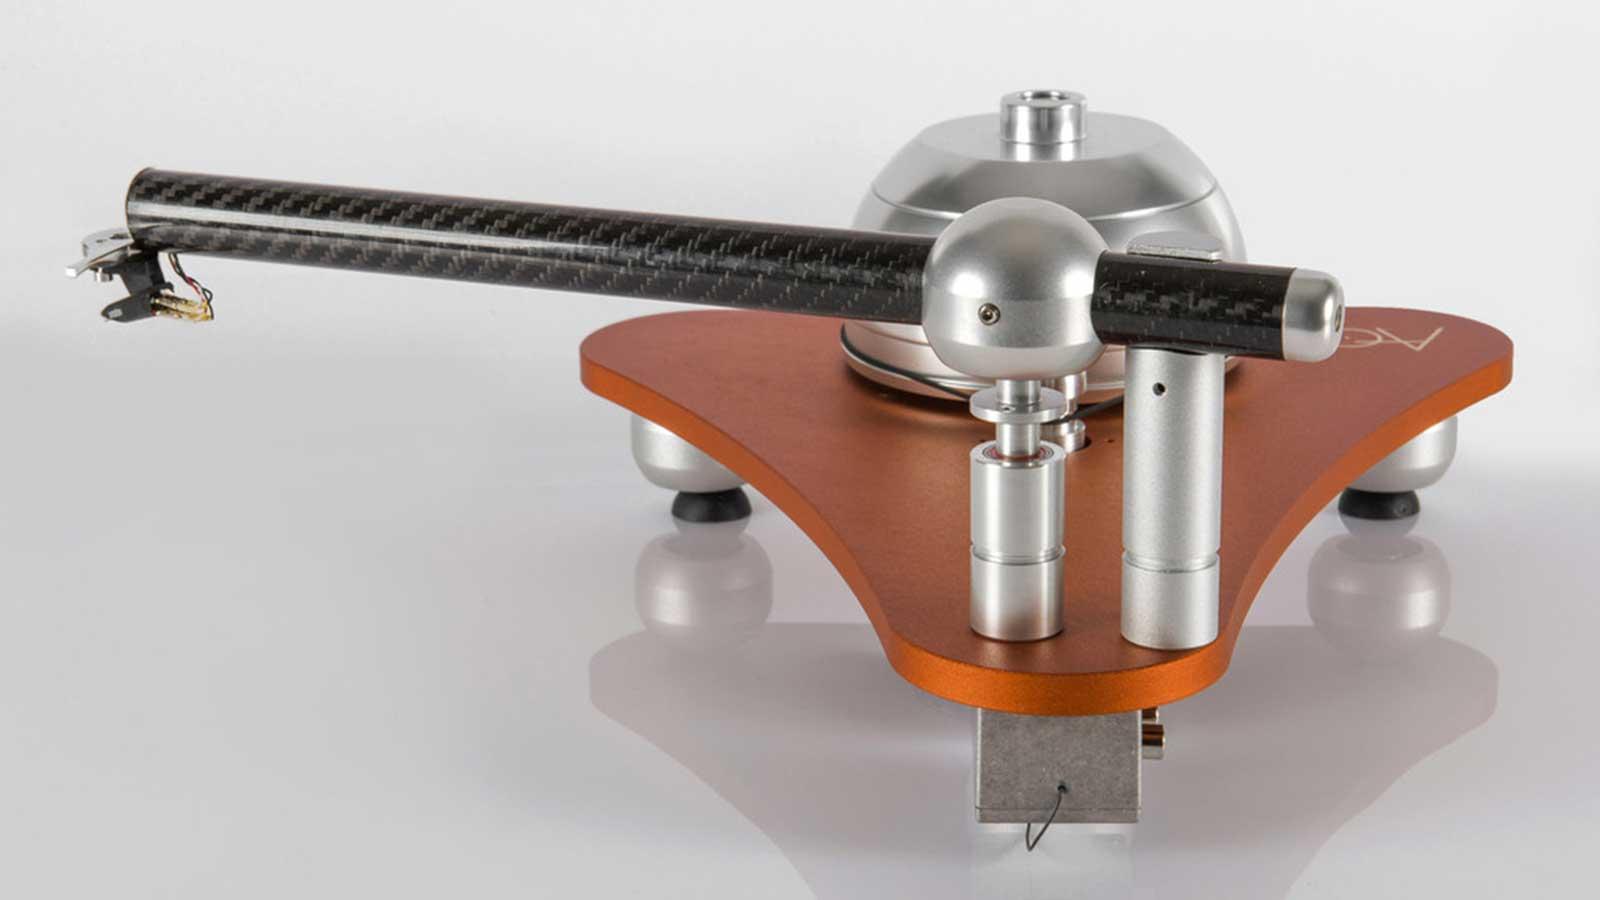 Atmo-Sfera-Platterless-Turntable-4